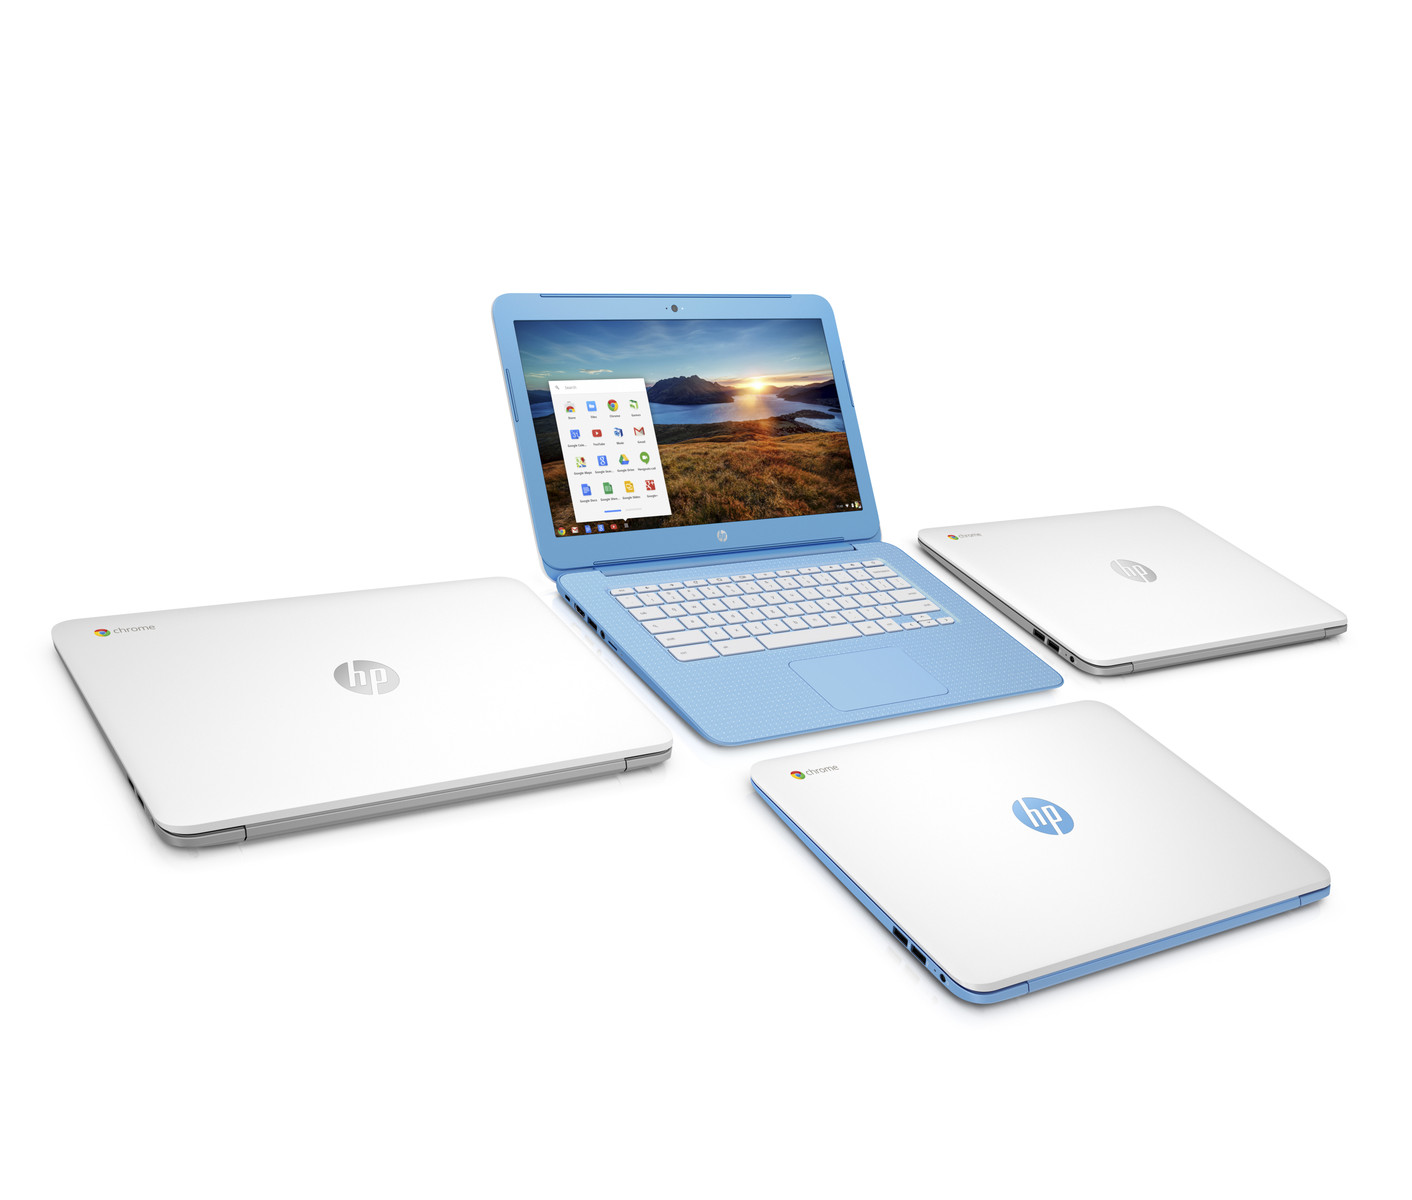 HP Announces Thinner Chromebook 14 With Celeron CPU